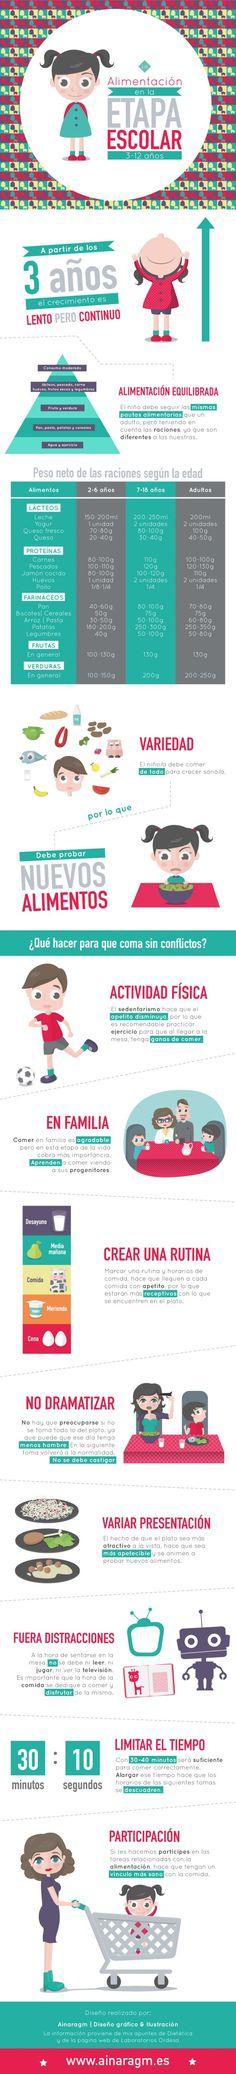 Infografía sobre la alimentación en la etapa escolar #alimentacion #salud #dietetica #diseno #ilustracion #infografia #hogarutil